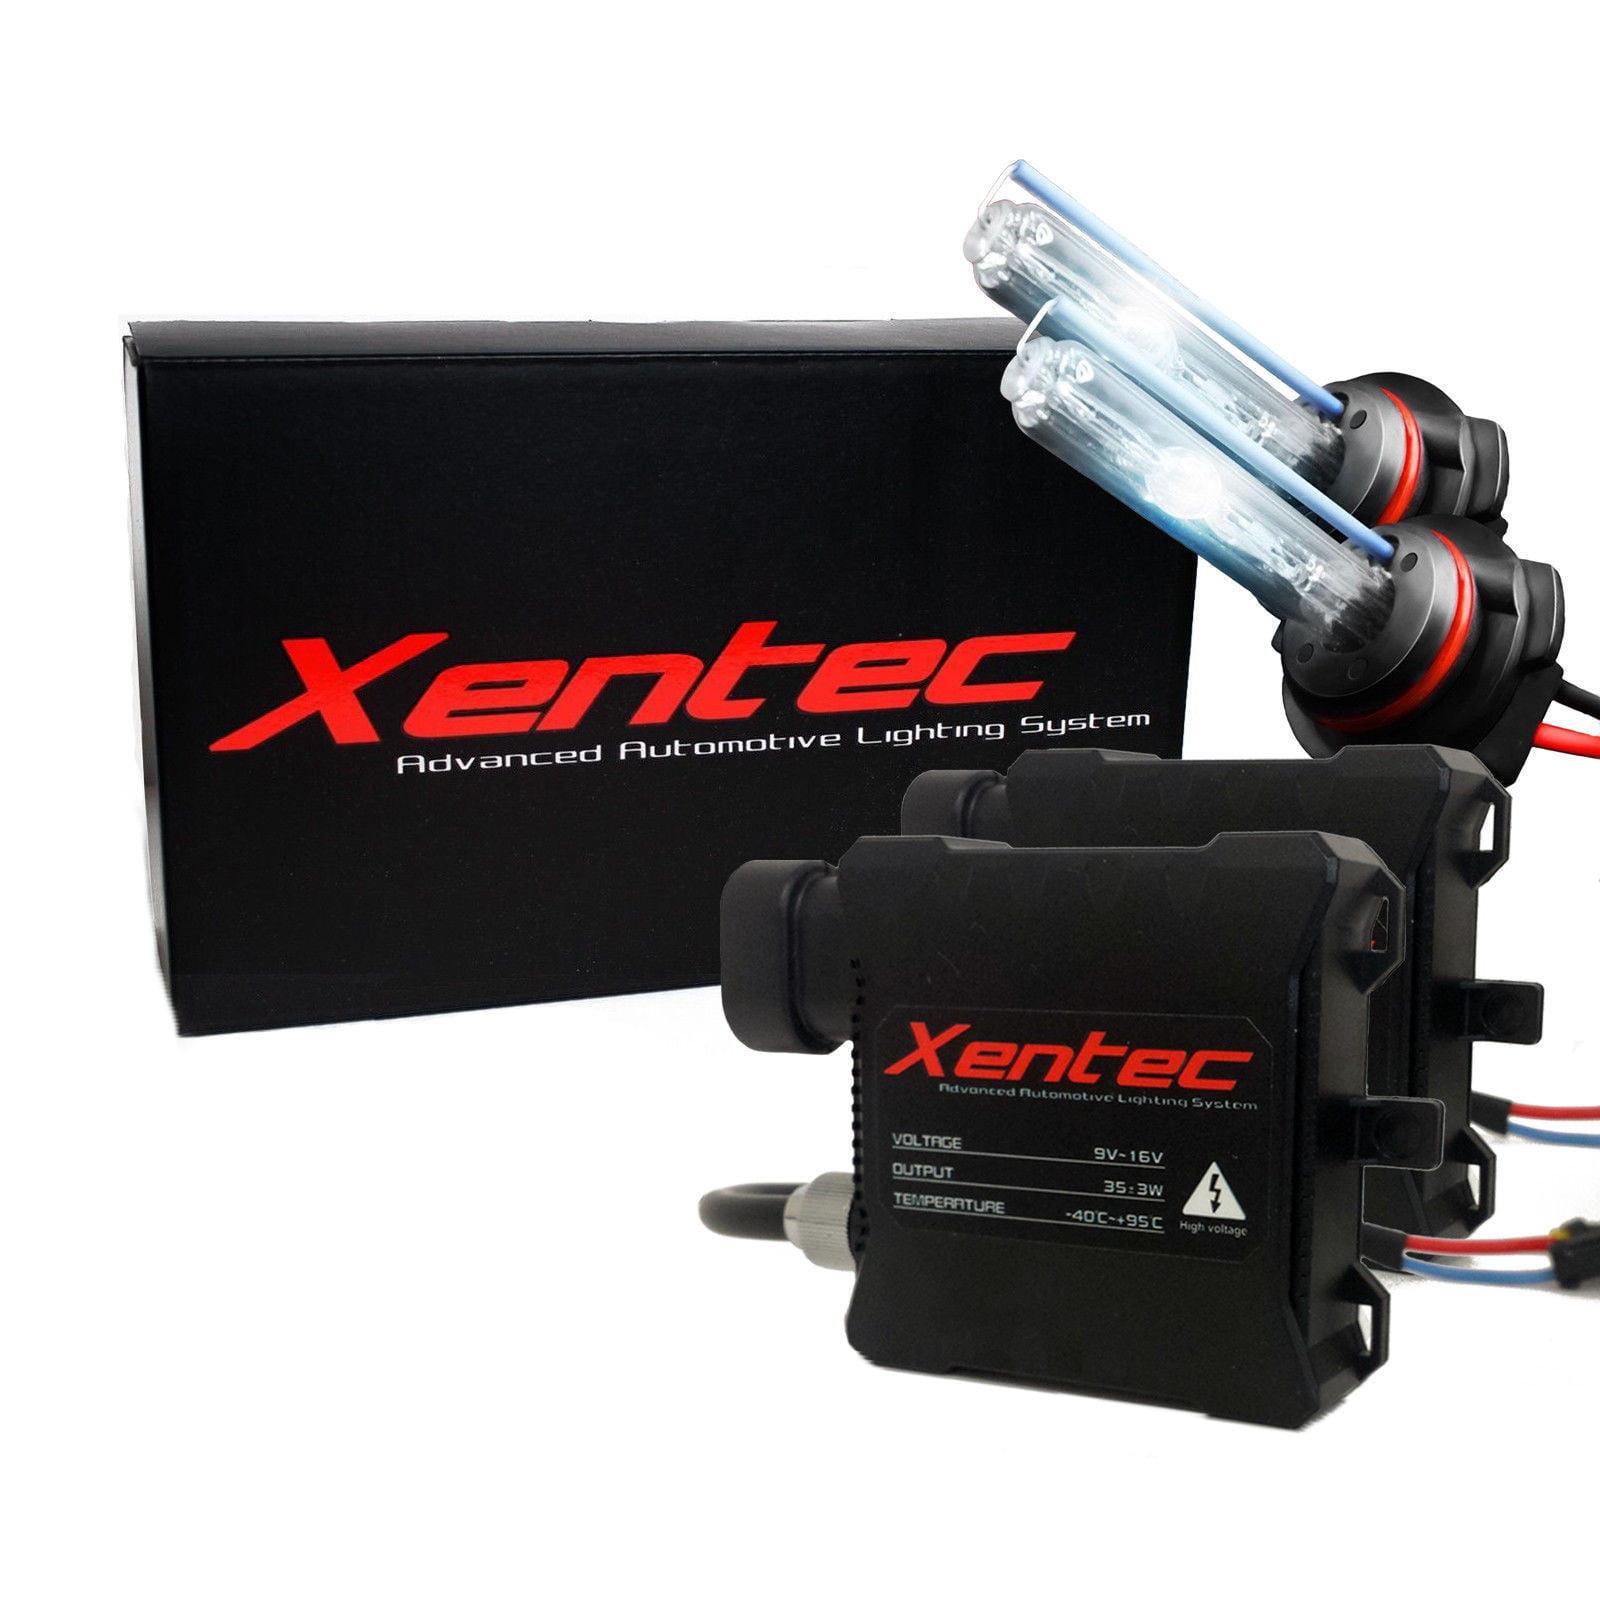 Xentec 8000K Xenon HID Kit for Honda CR-Z 2011-2016 Headlight 9003 H4 Super Slim Digital HID Conversion Lights